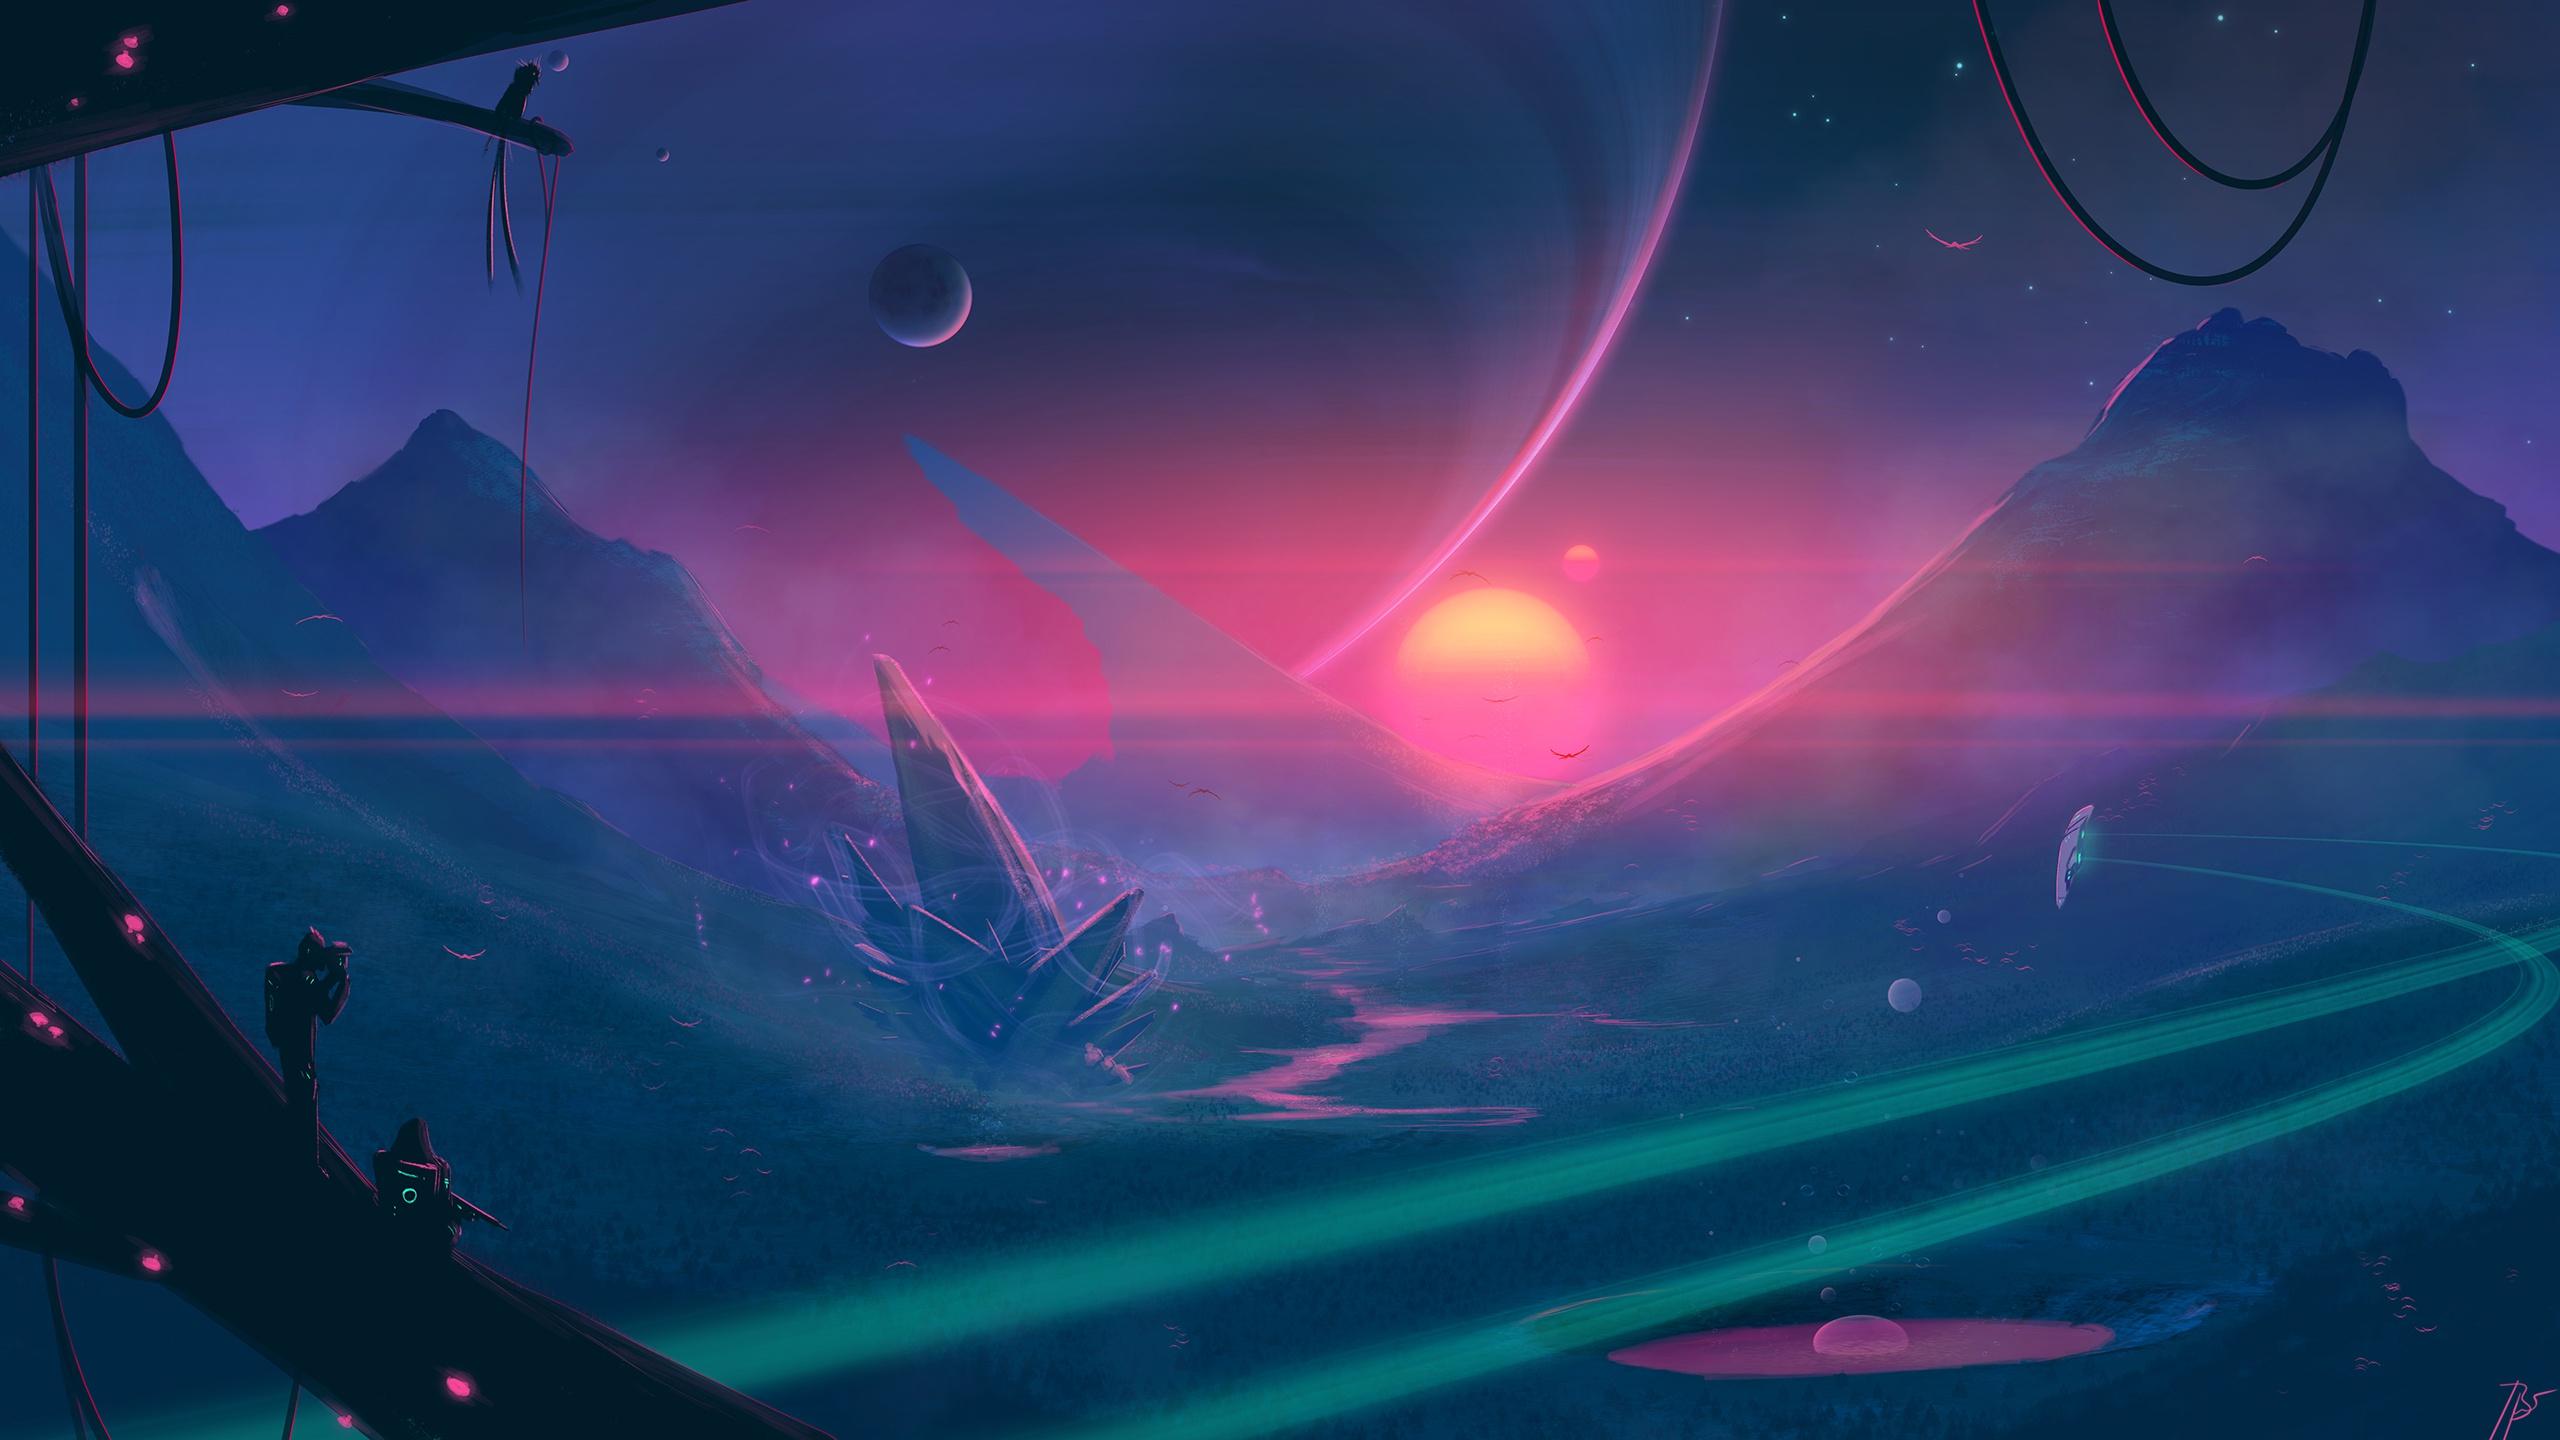 Moon Mountain Spaceship Exploration 2560x1440